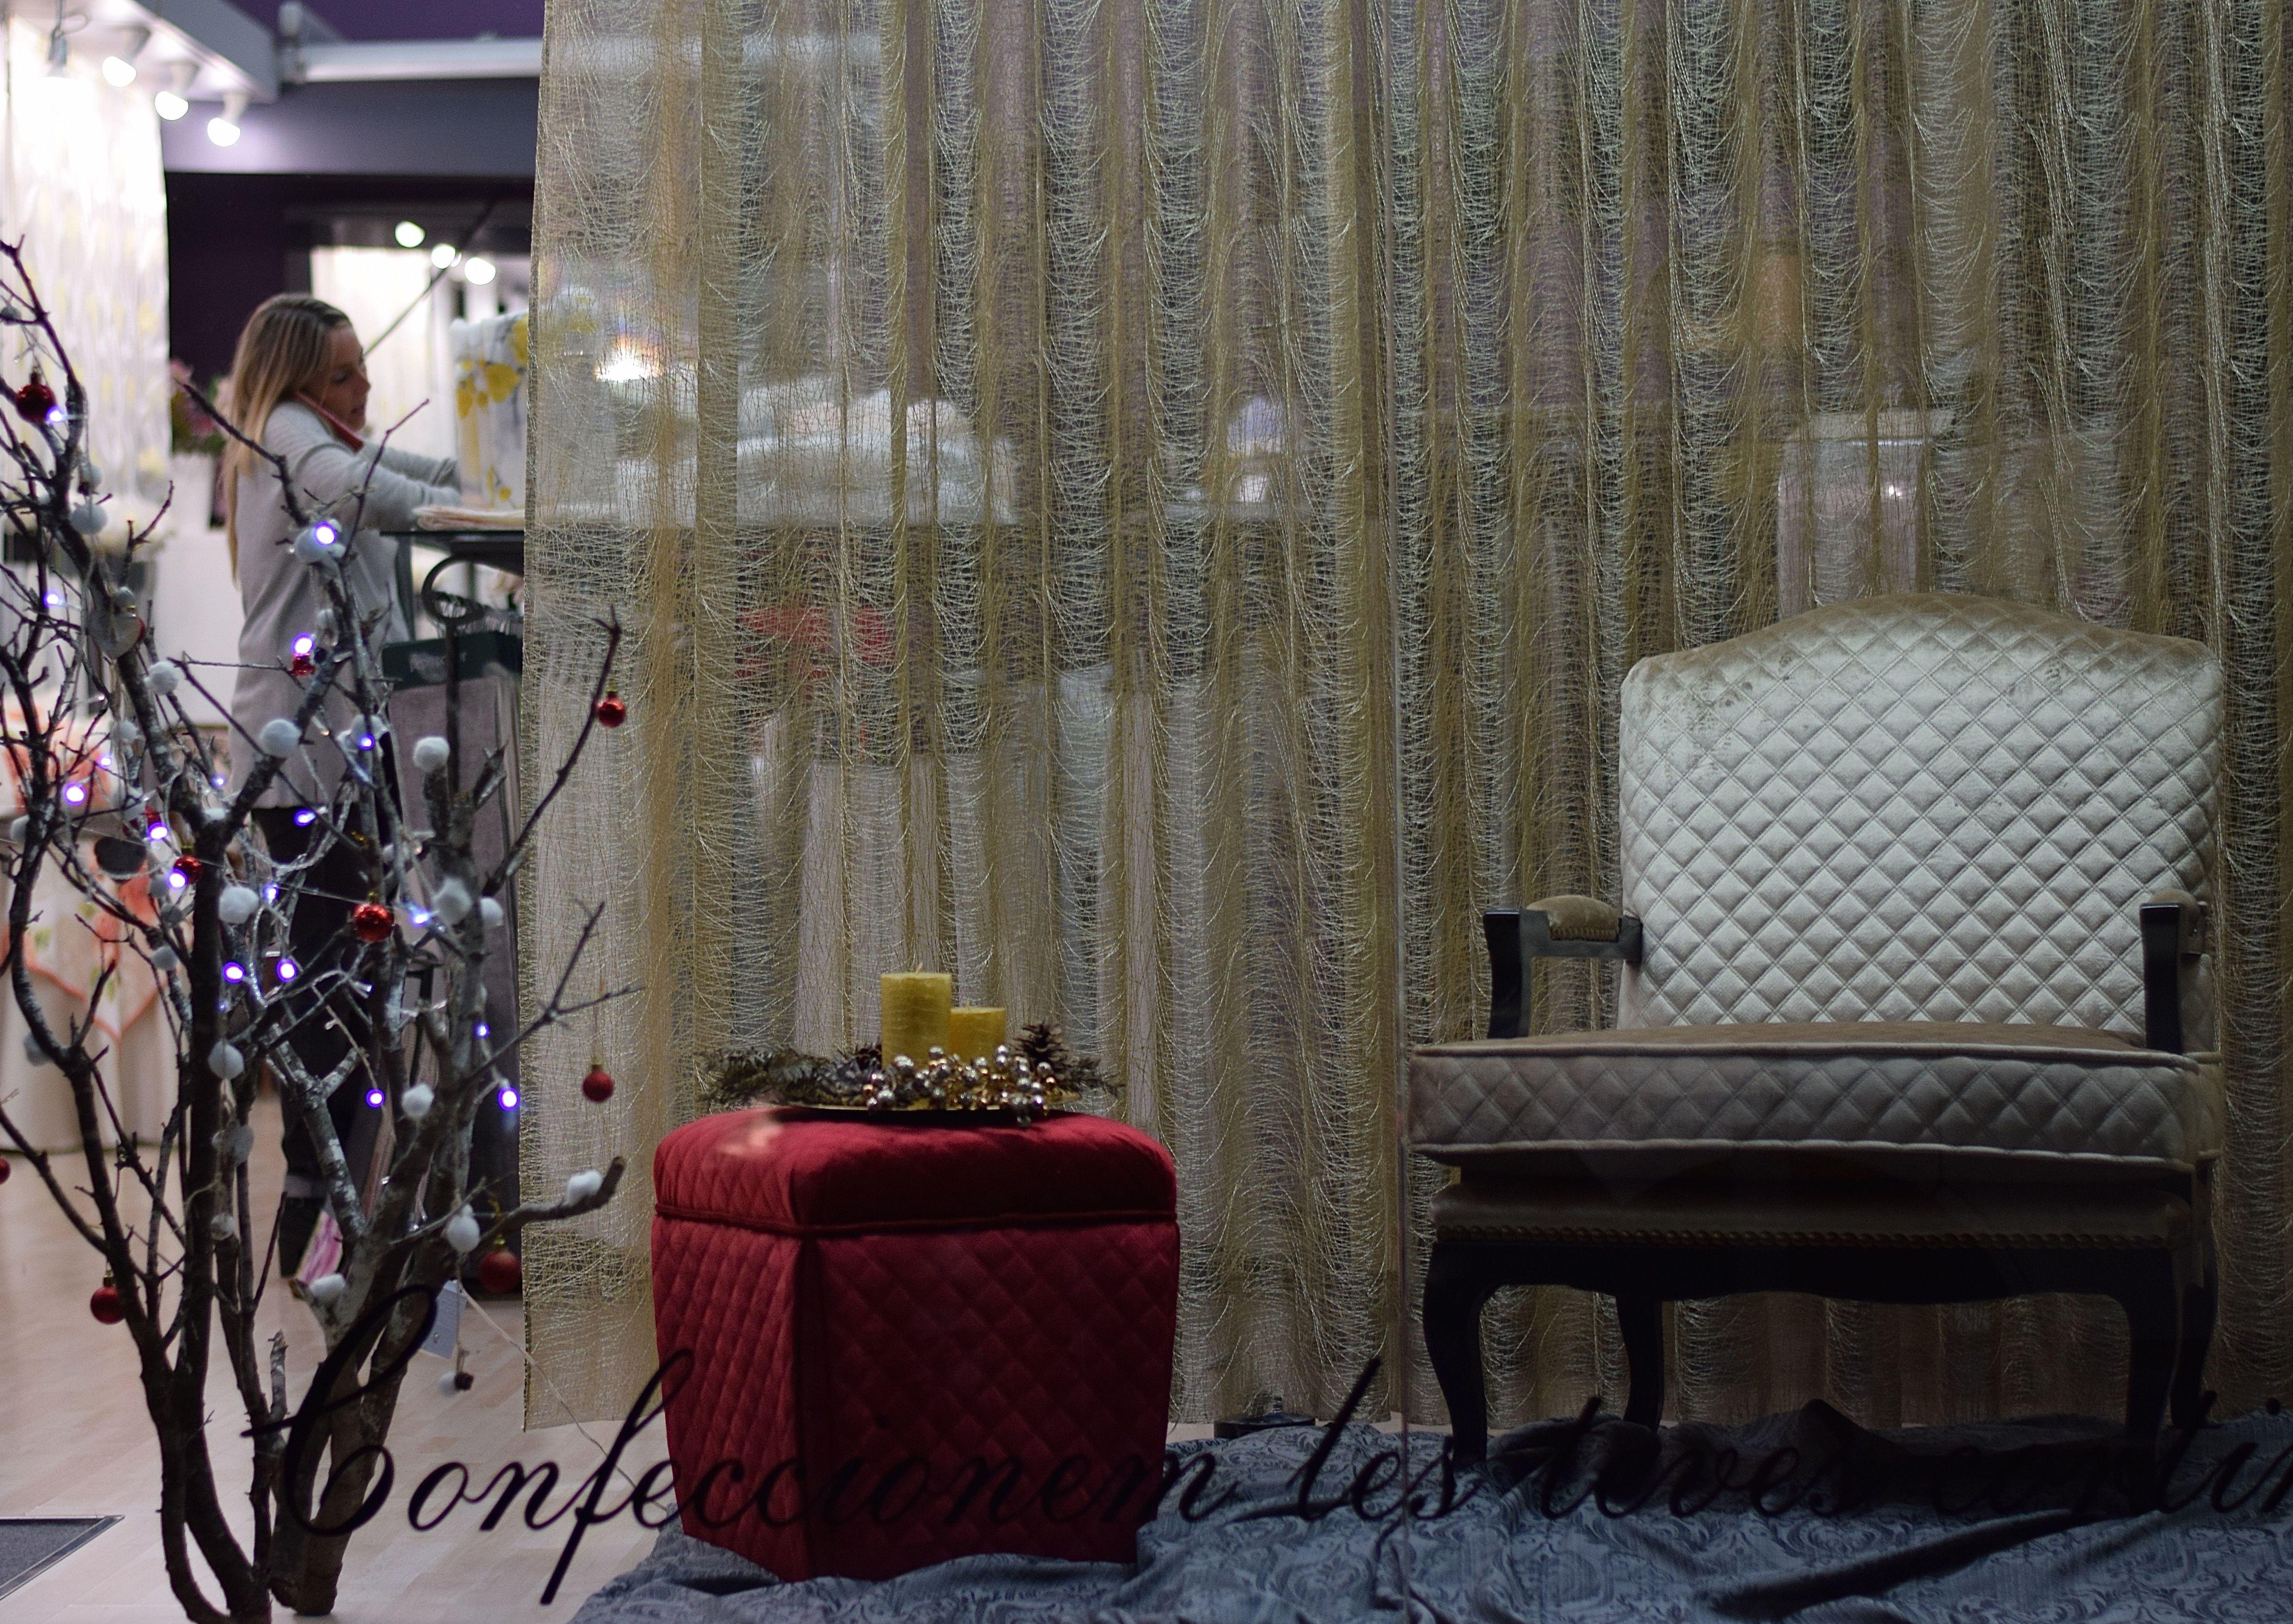 Decoración textil, tanto en cortinas